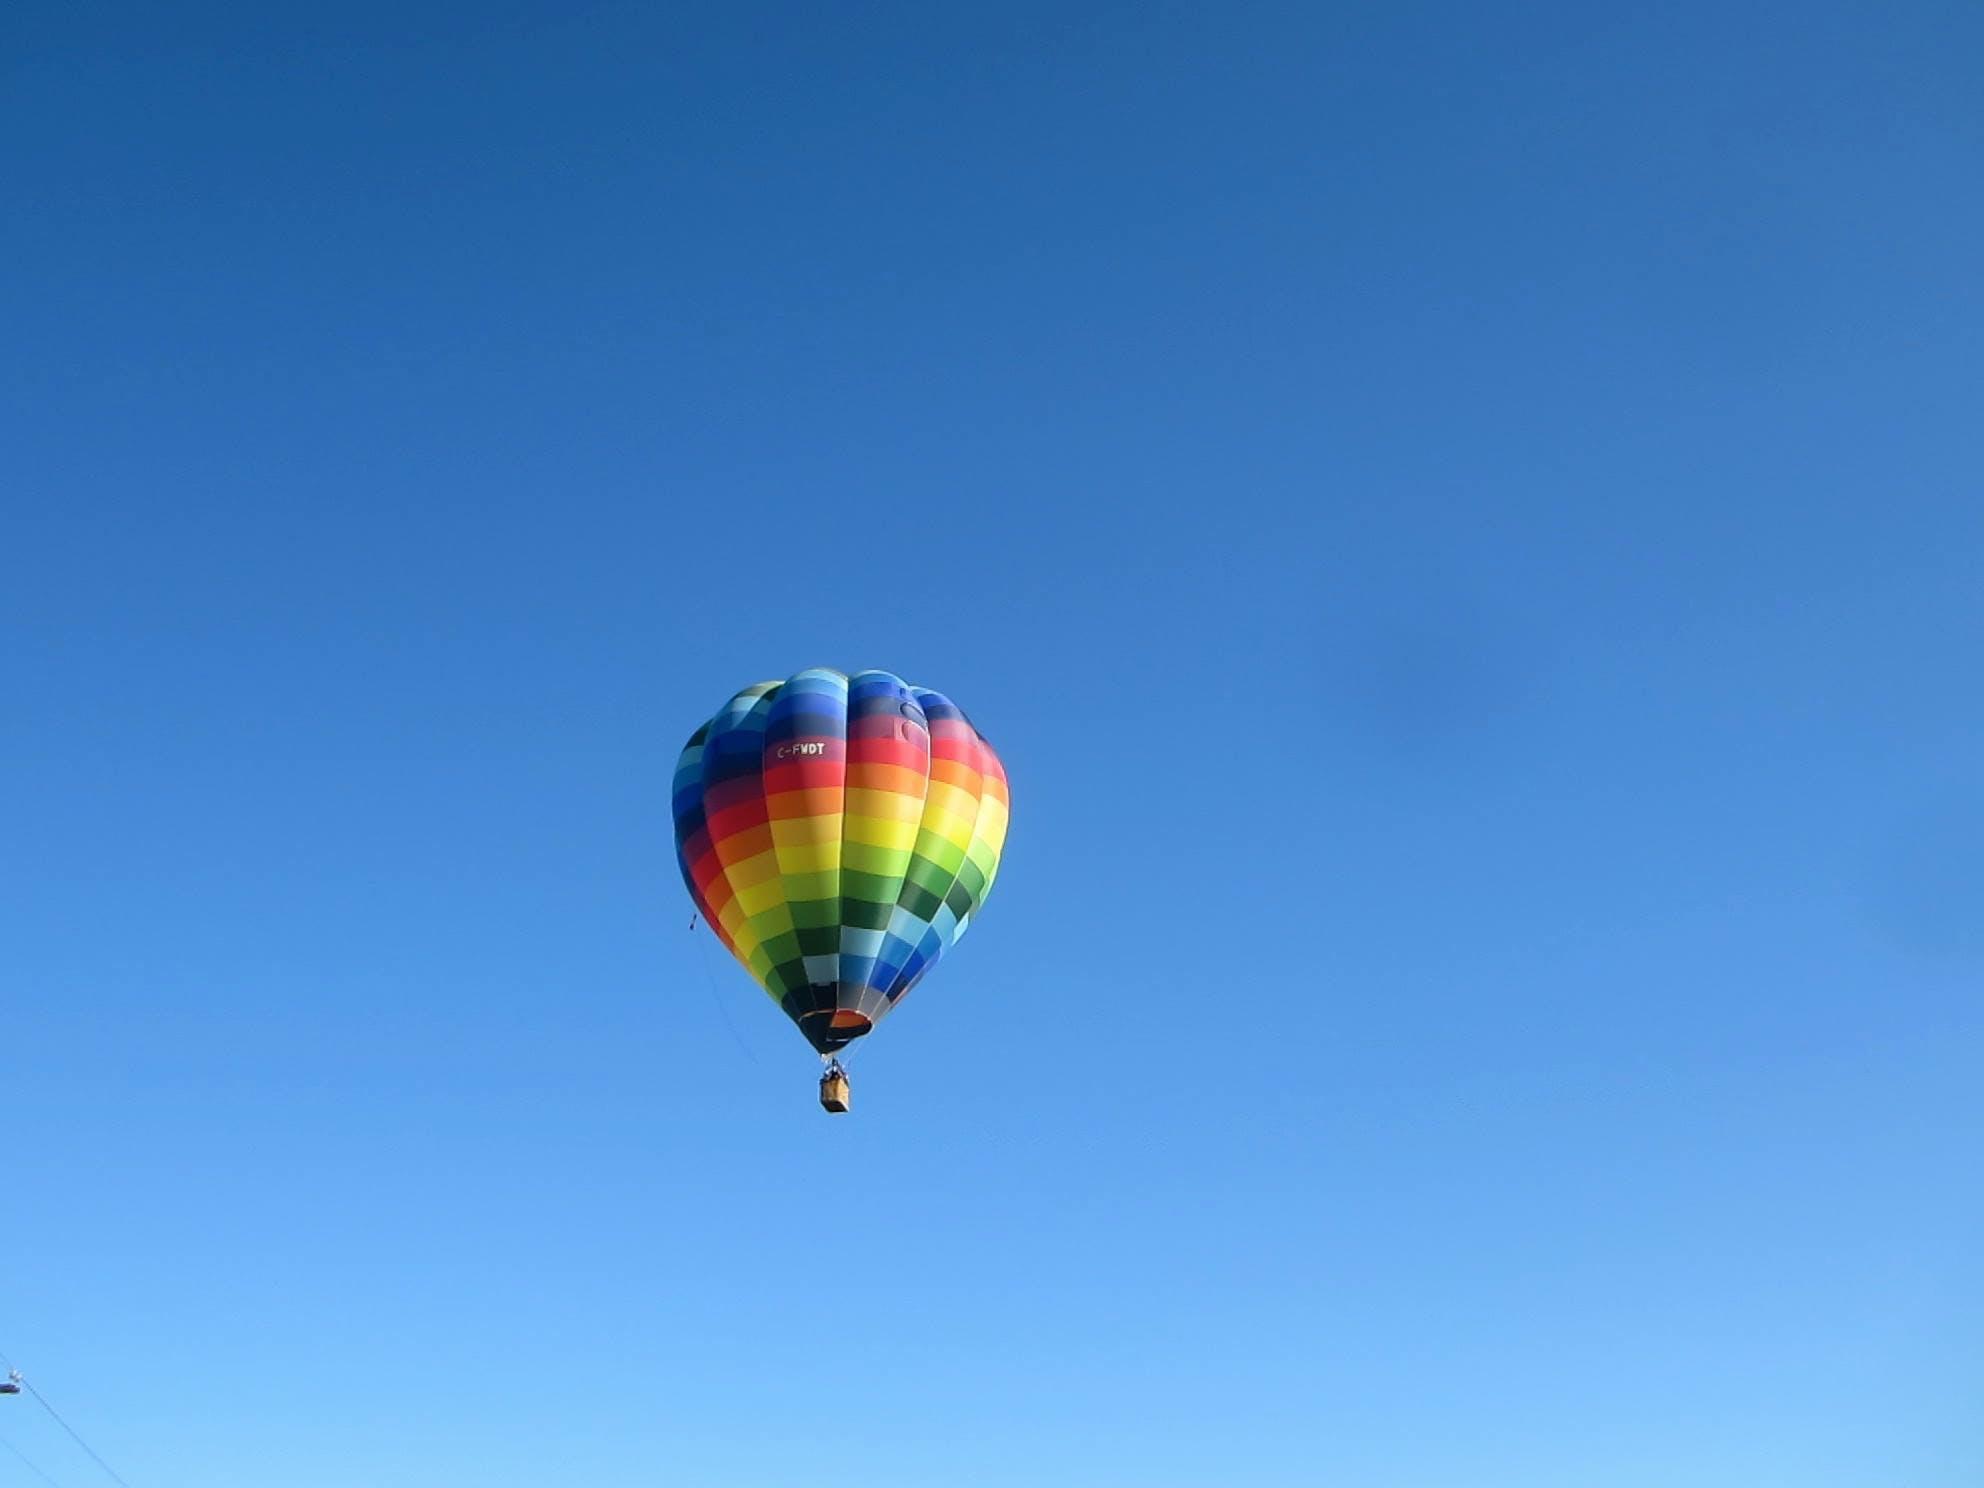 Blue, Yellow, and Green Hot Air Balloon